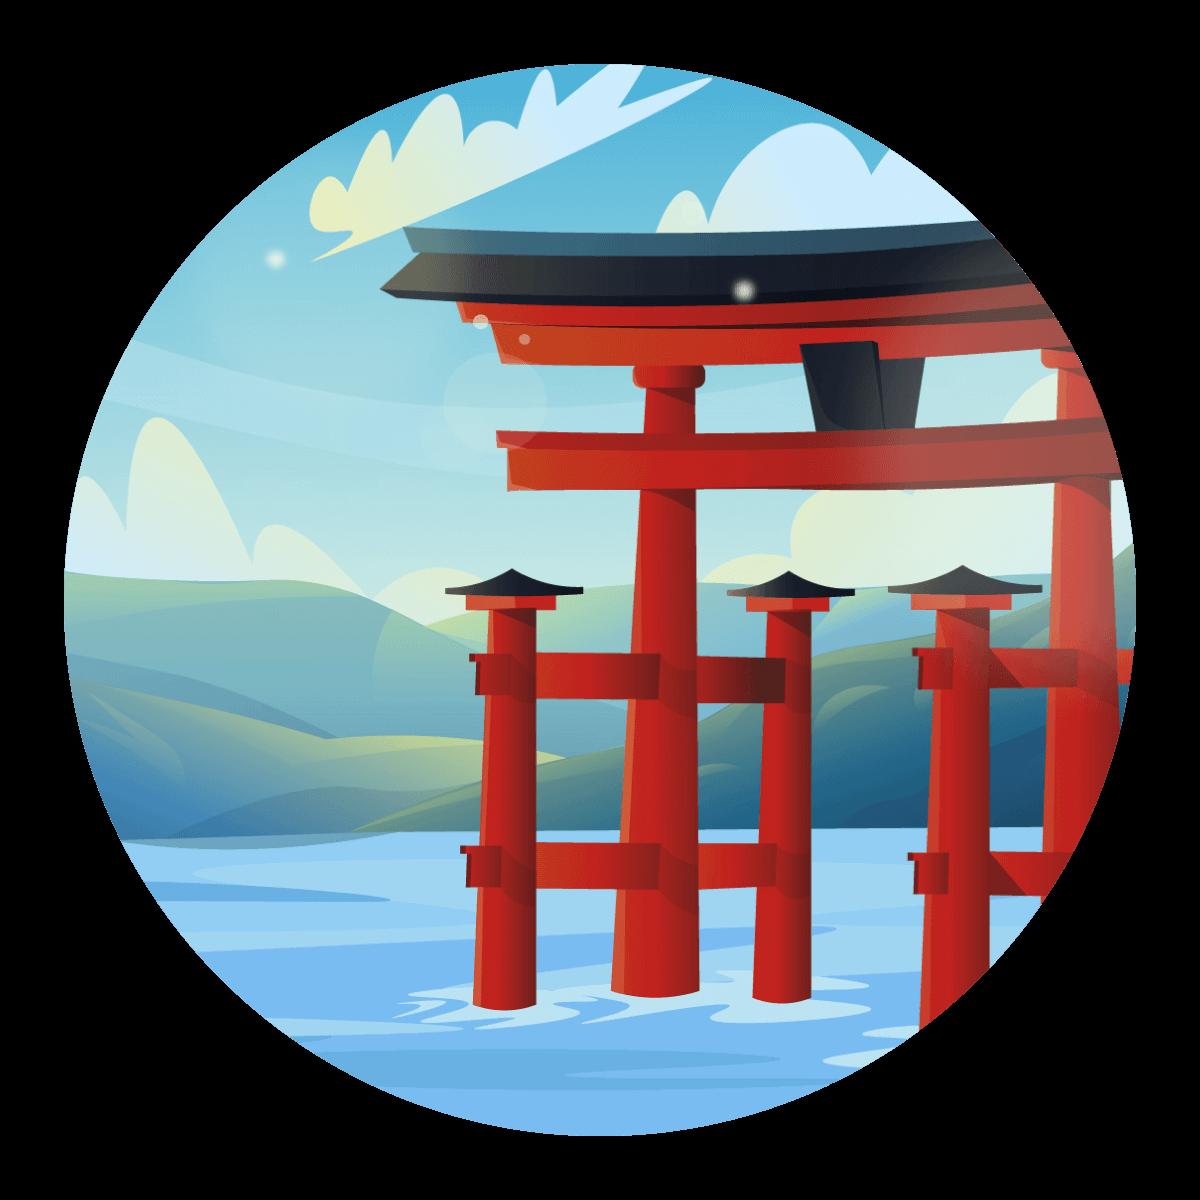 Free SVG Illustration